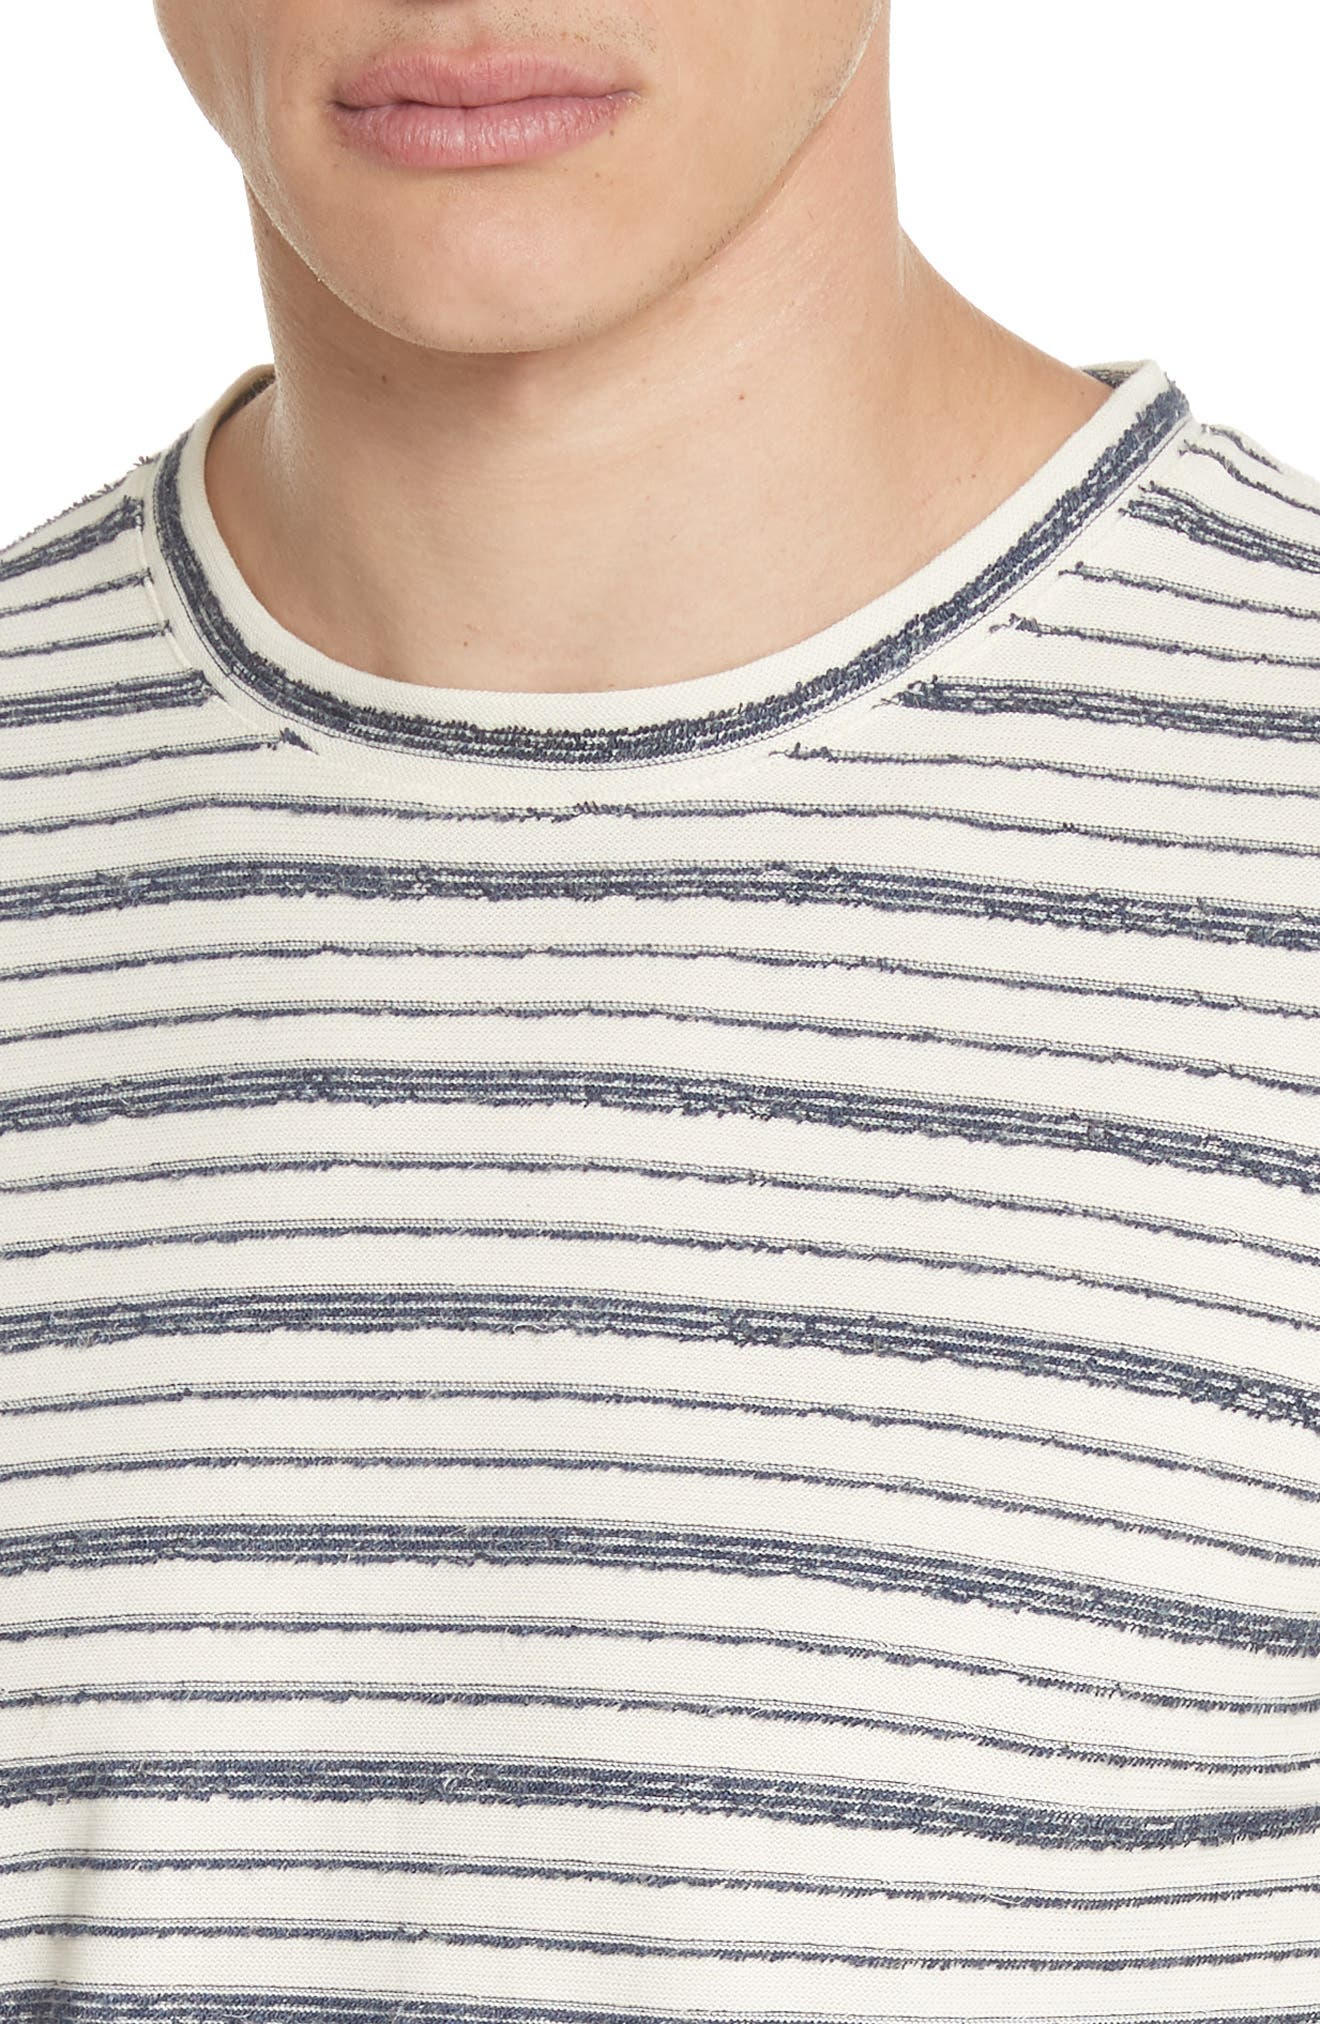 Niels Textured Stripe T-Shirt,                             Alternate thumbnail 4, color,                             DARK NAVY